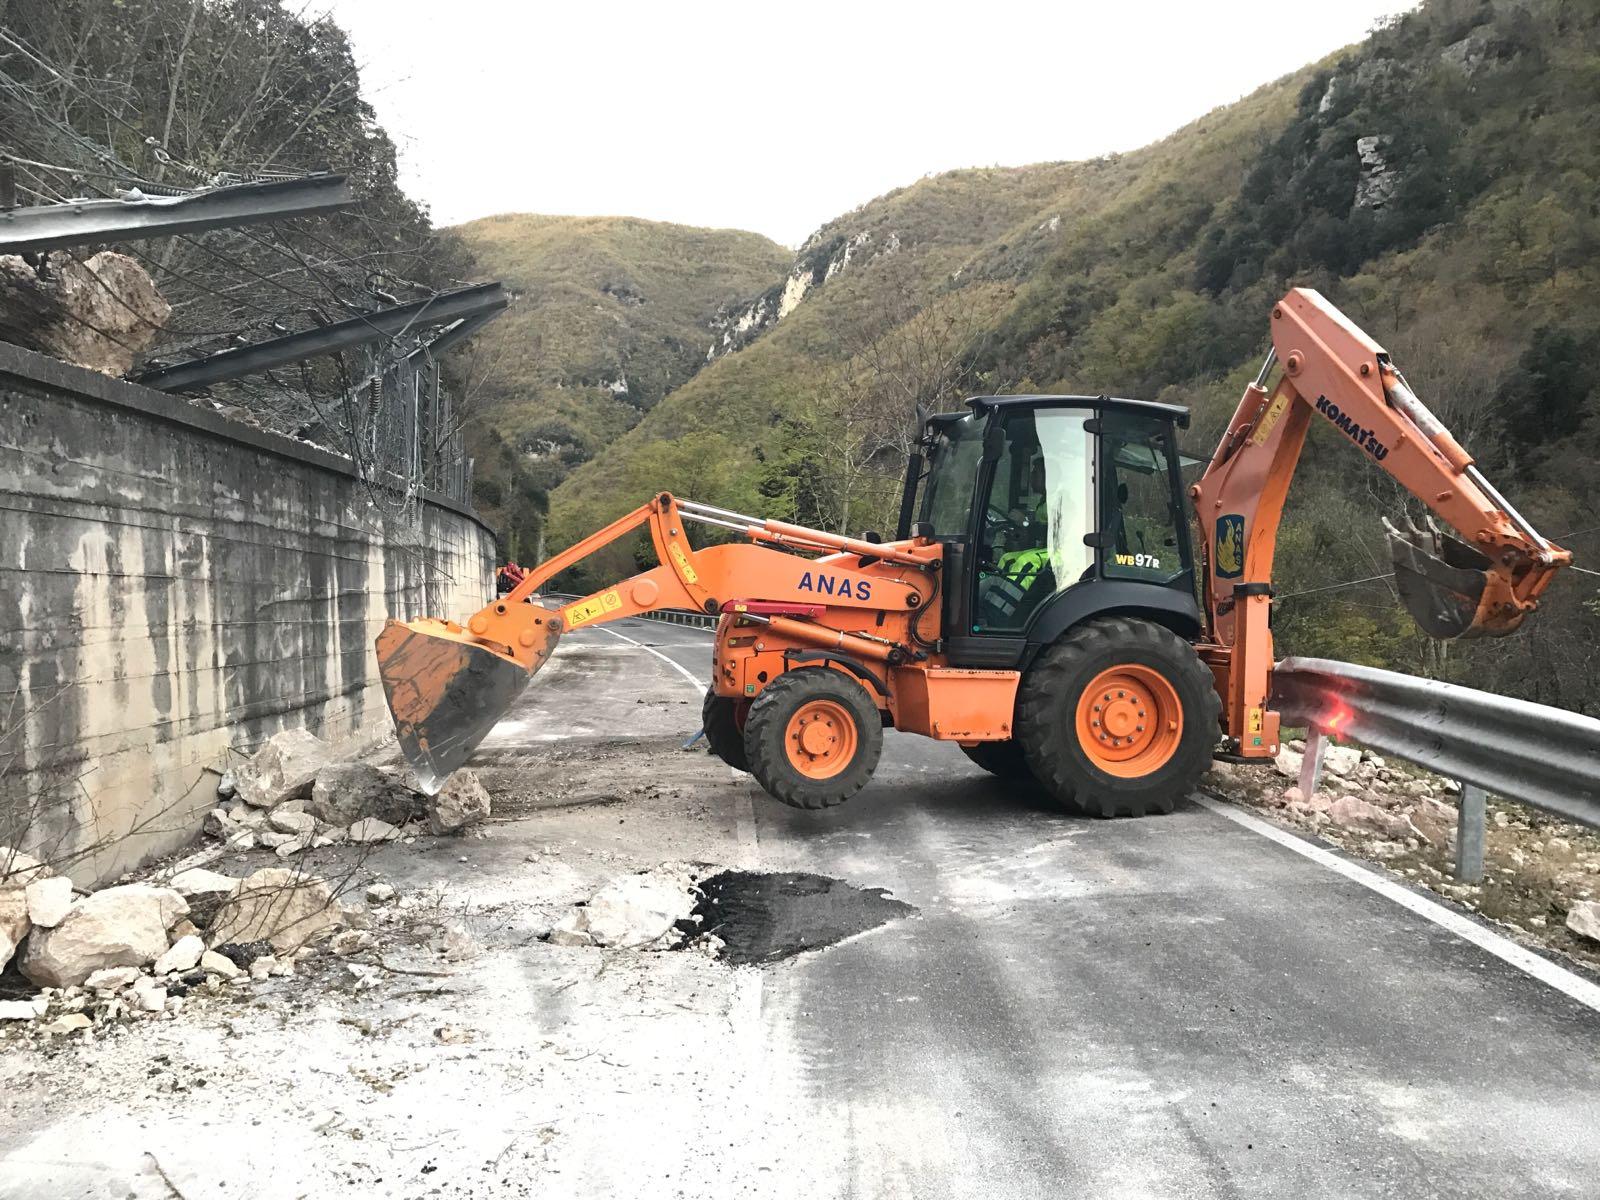 01 SS685 interventi Anas caduta massi sisma centro italia